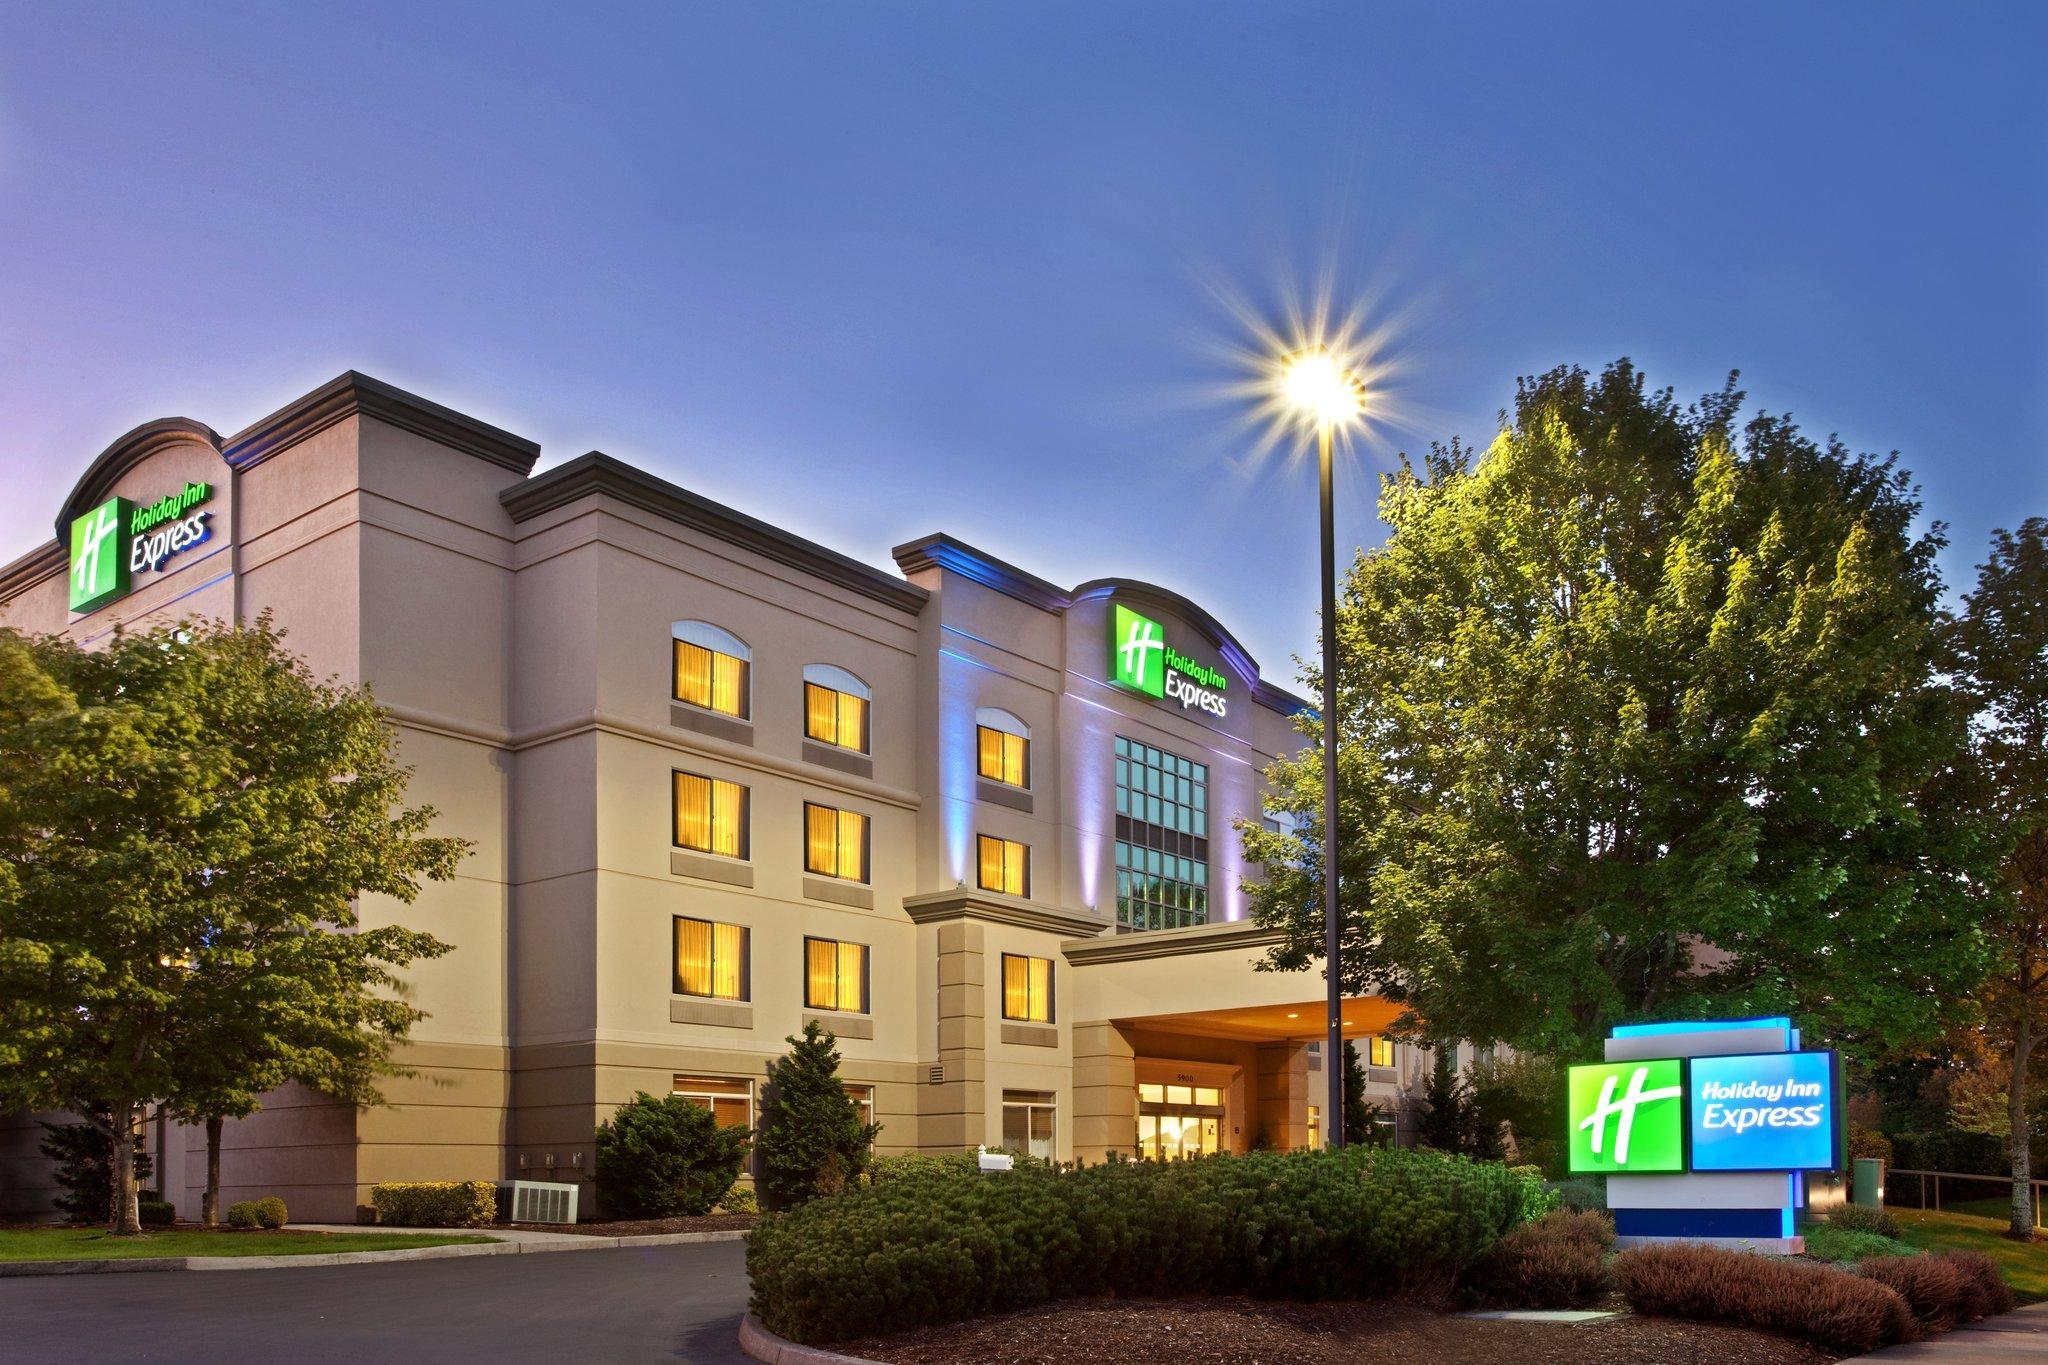 Holiday Inn Express Portland West Hillsboro